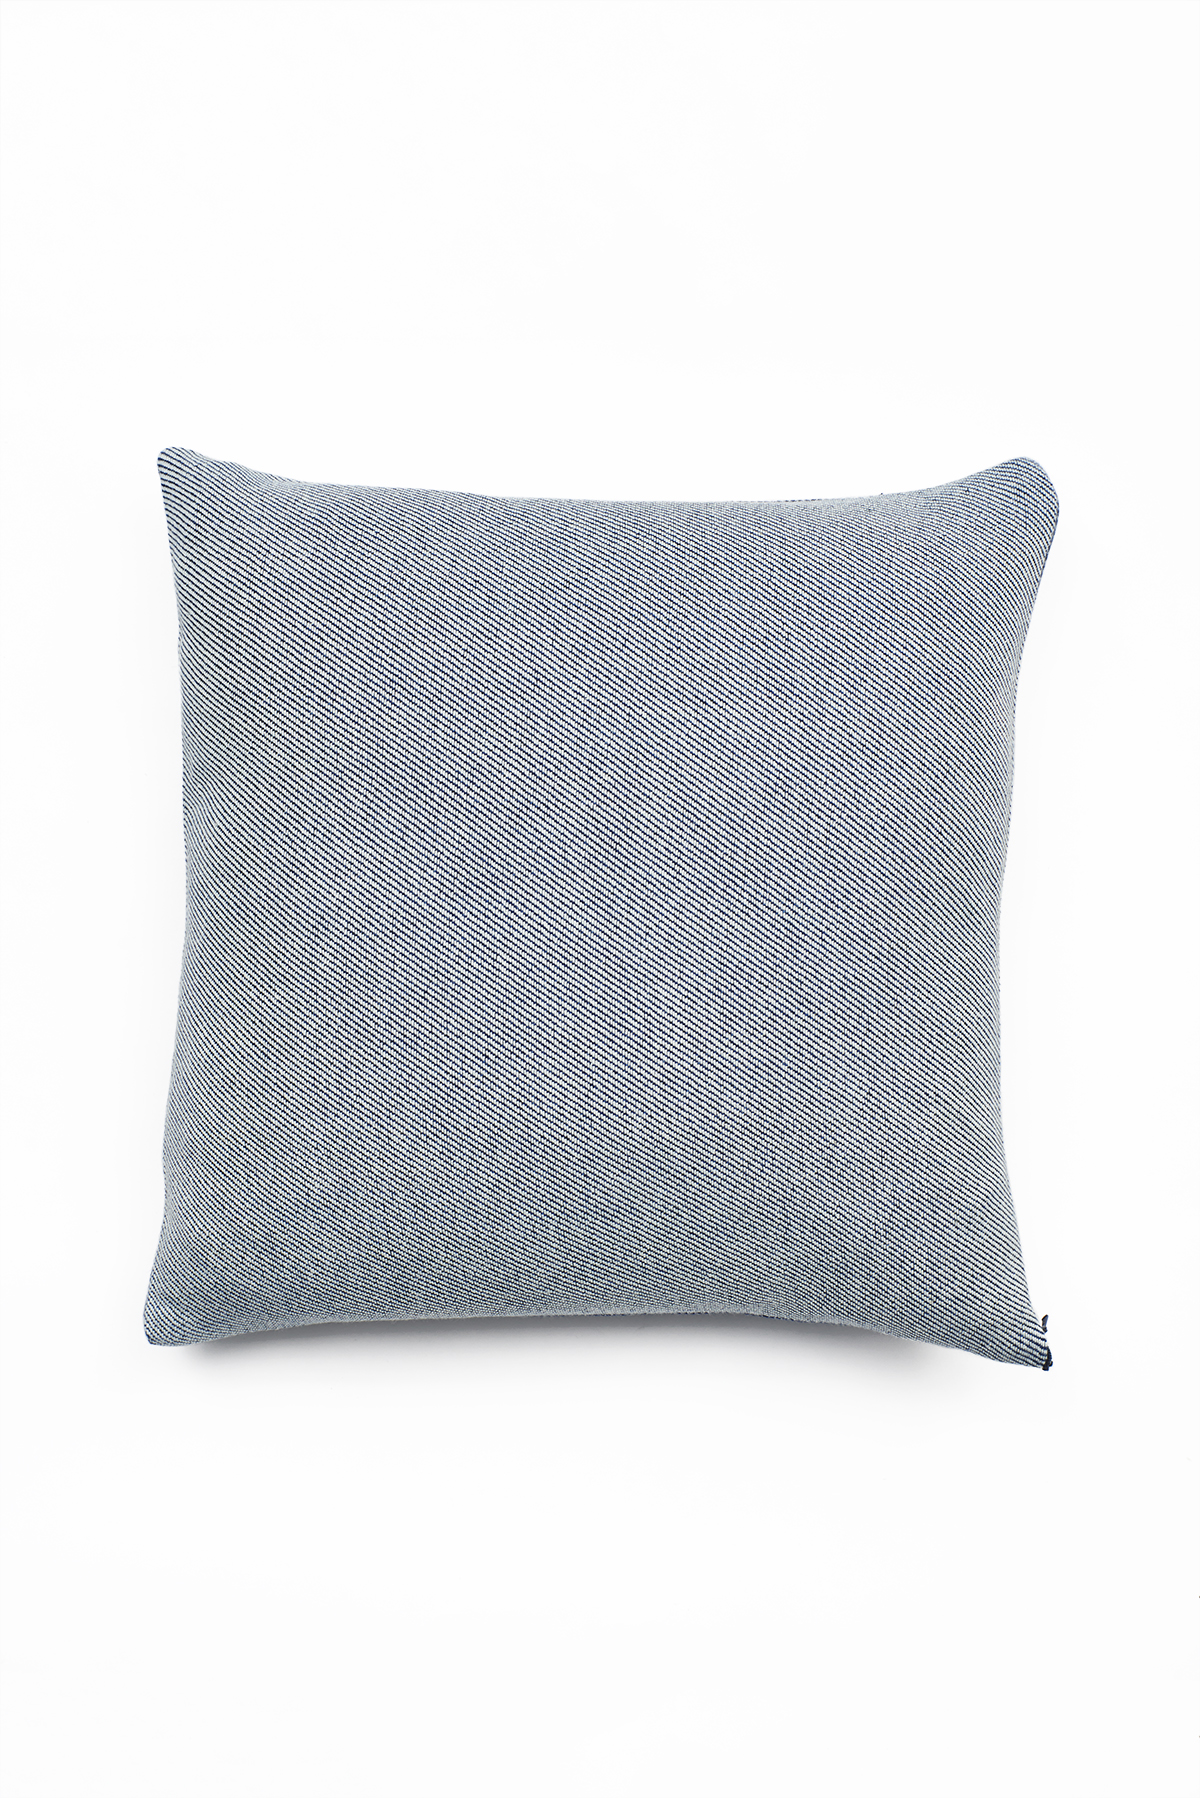 56838e5abb6c 'Lane x London Cloth' Indigo Cotton Cushion — Lane